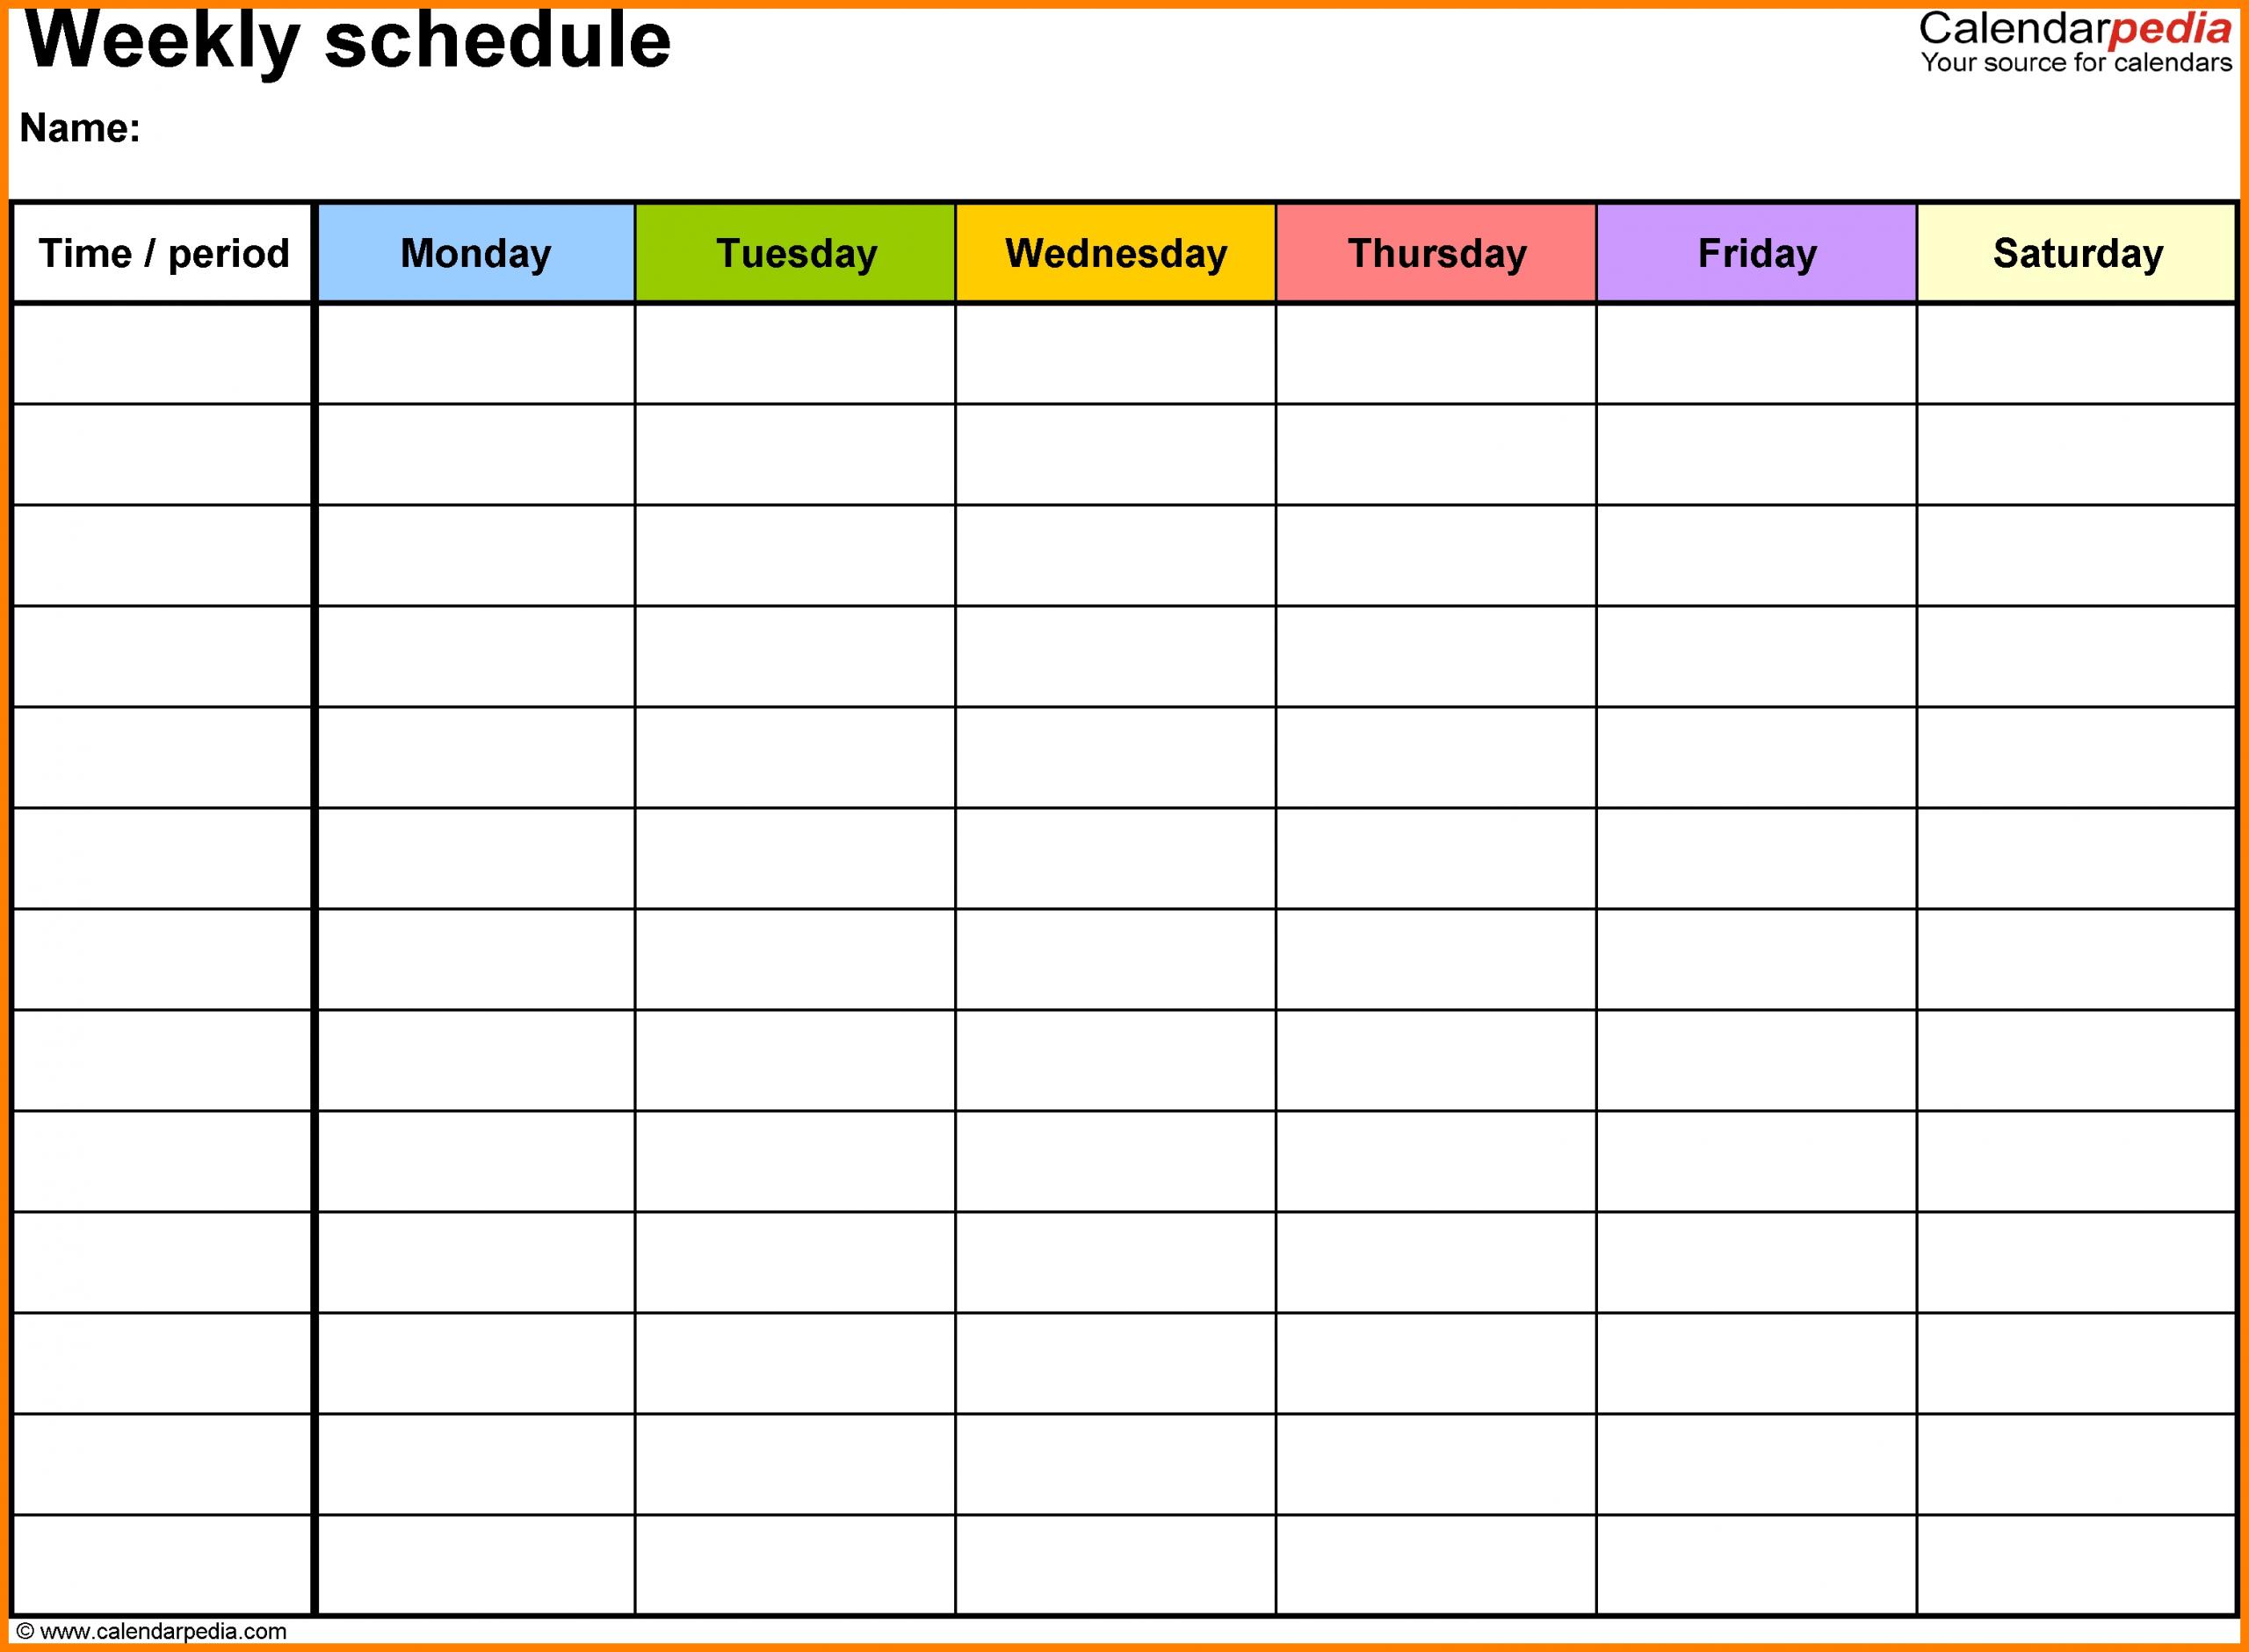 Printable Weekly Calendar With Time Slots – Calendar Interactive Calendar With Time Slots Free